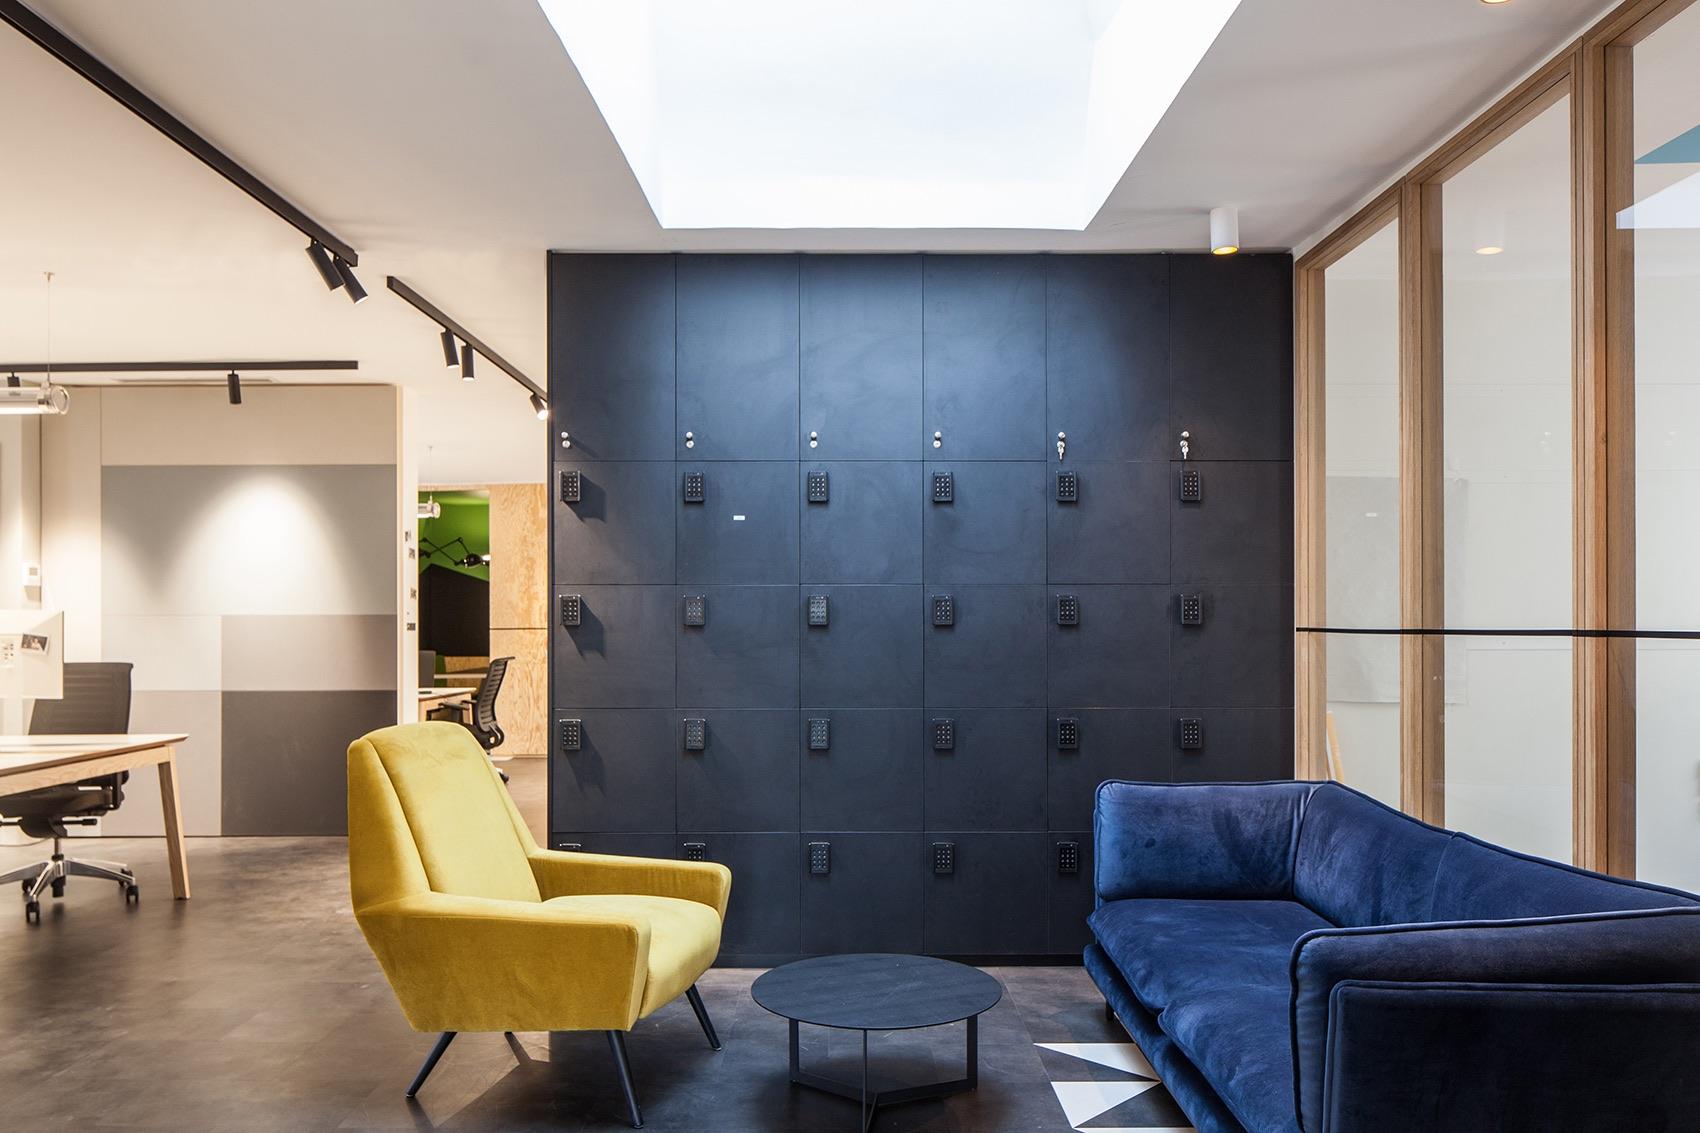 pwc-paris-office-33